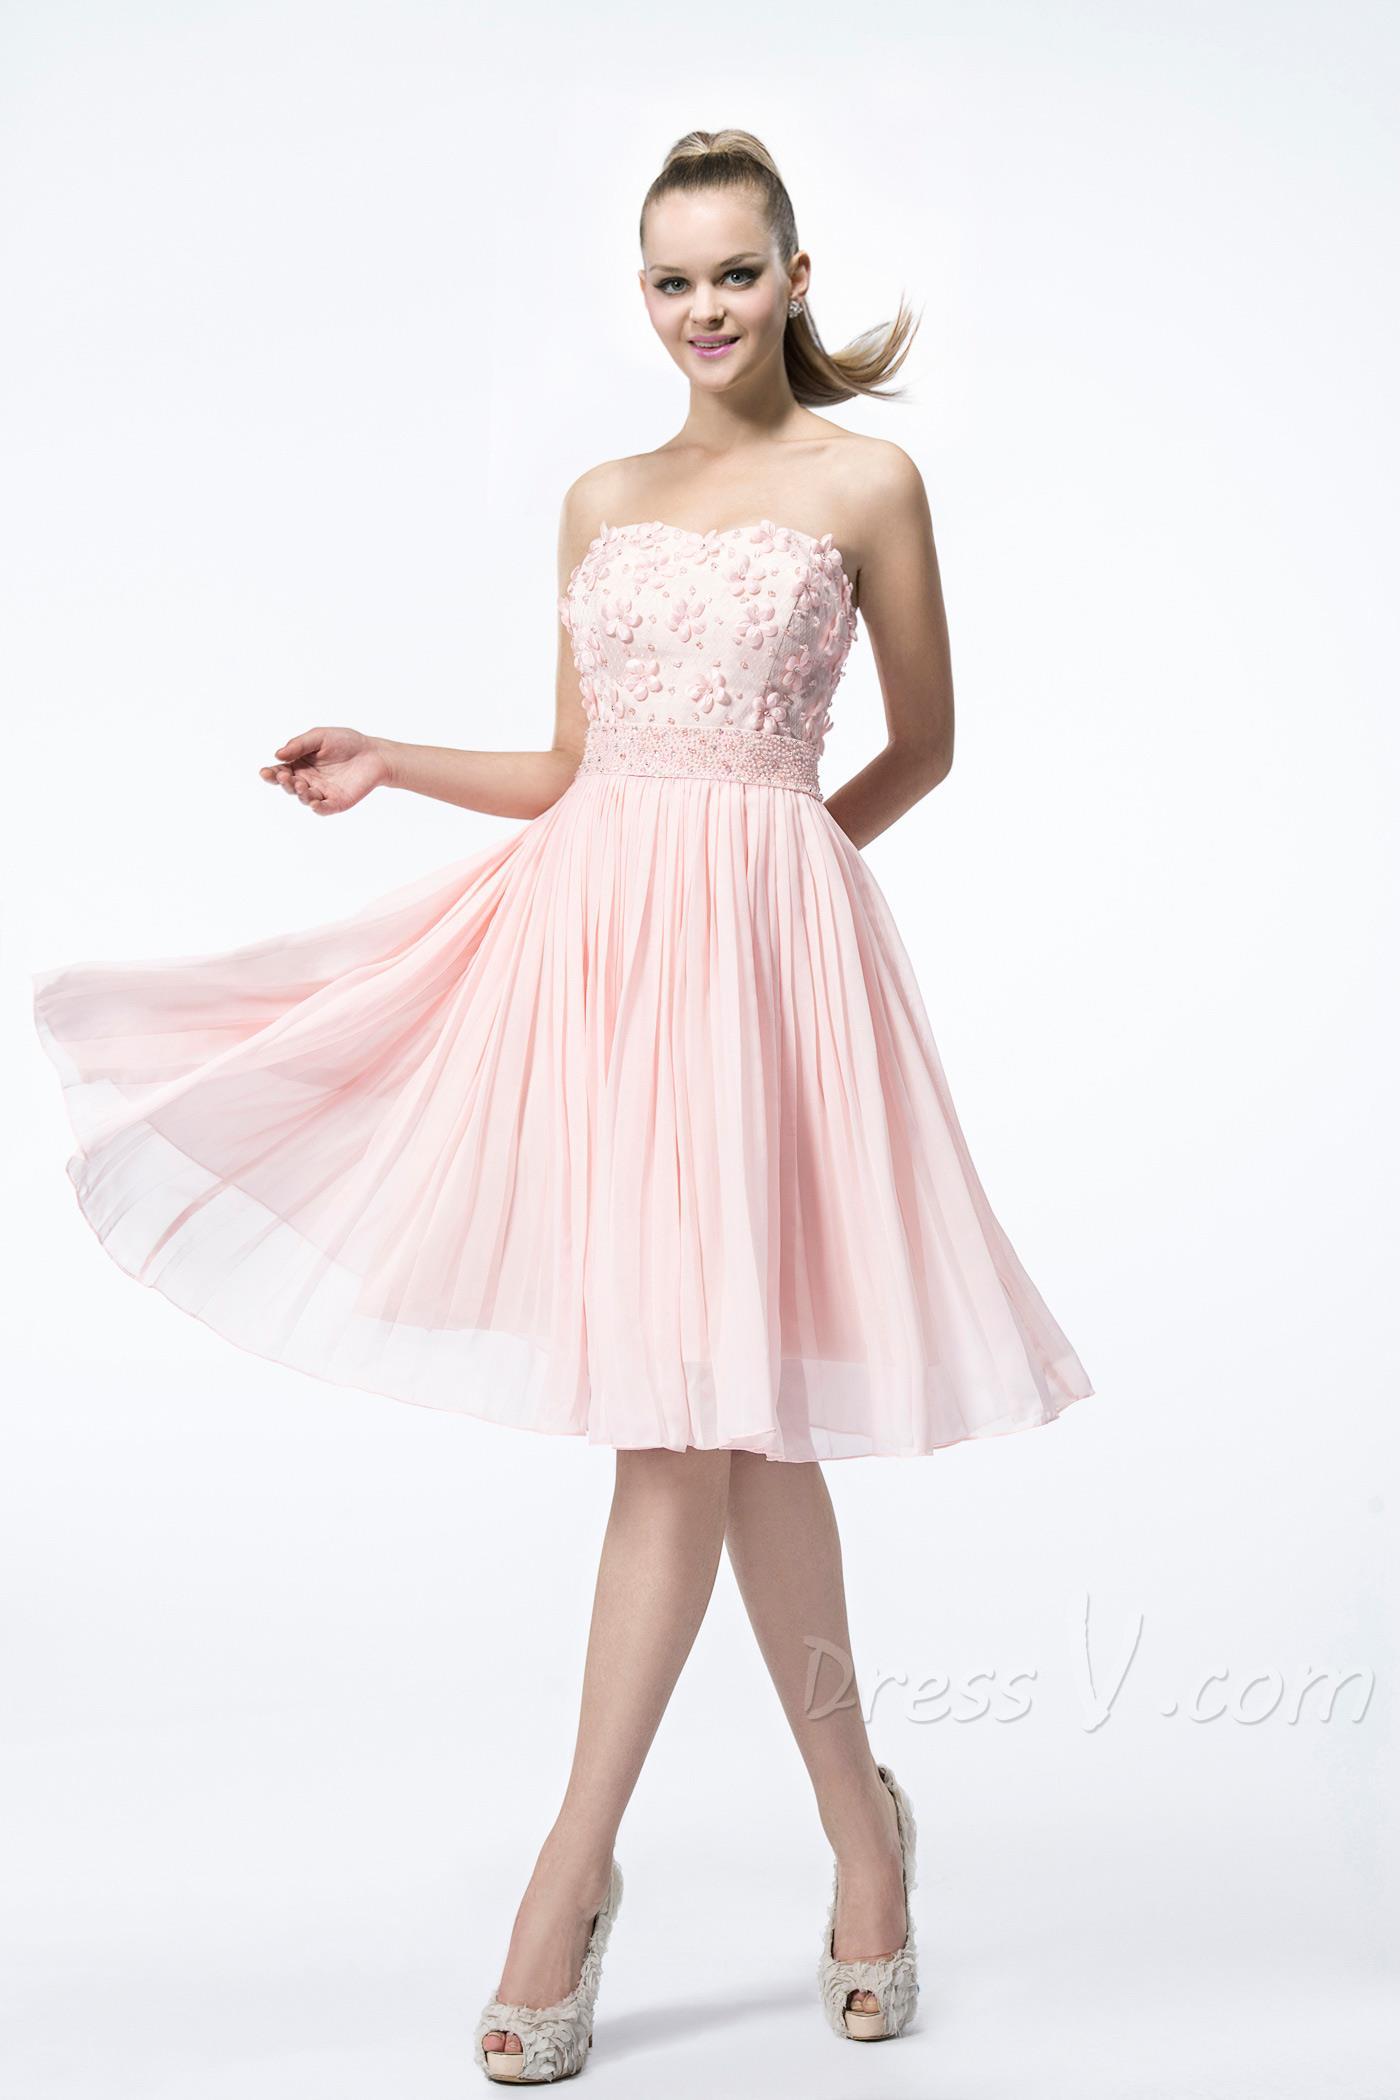 Classy Homecoming Dresses - Plus Size Masquerade Dresses